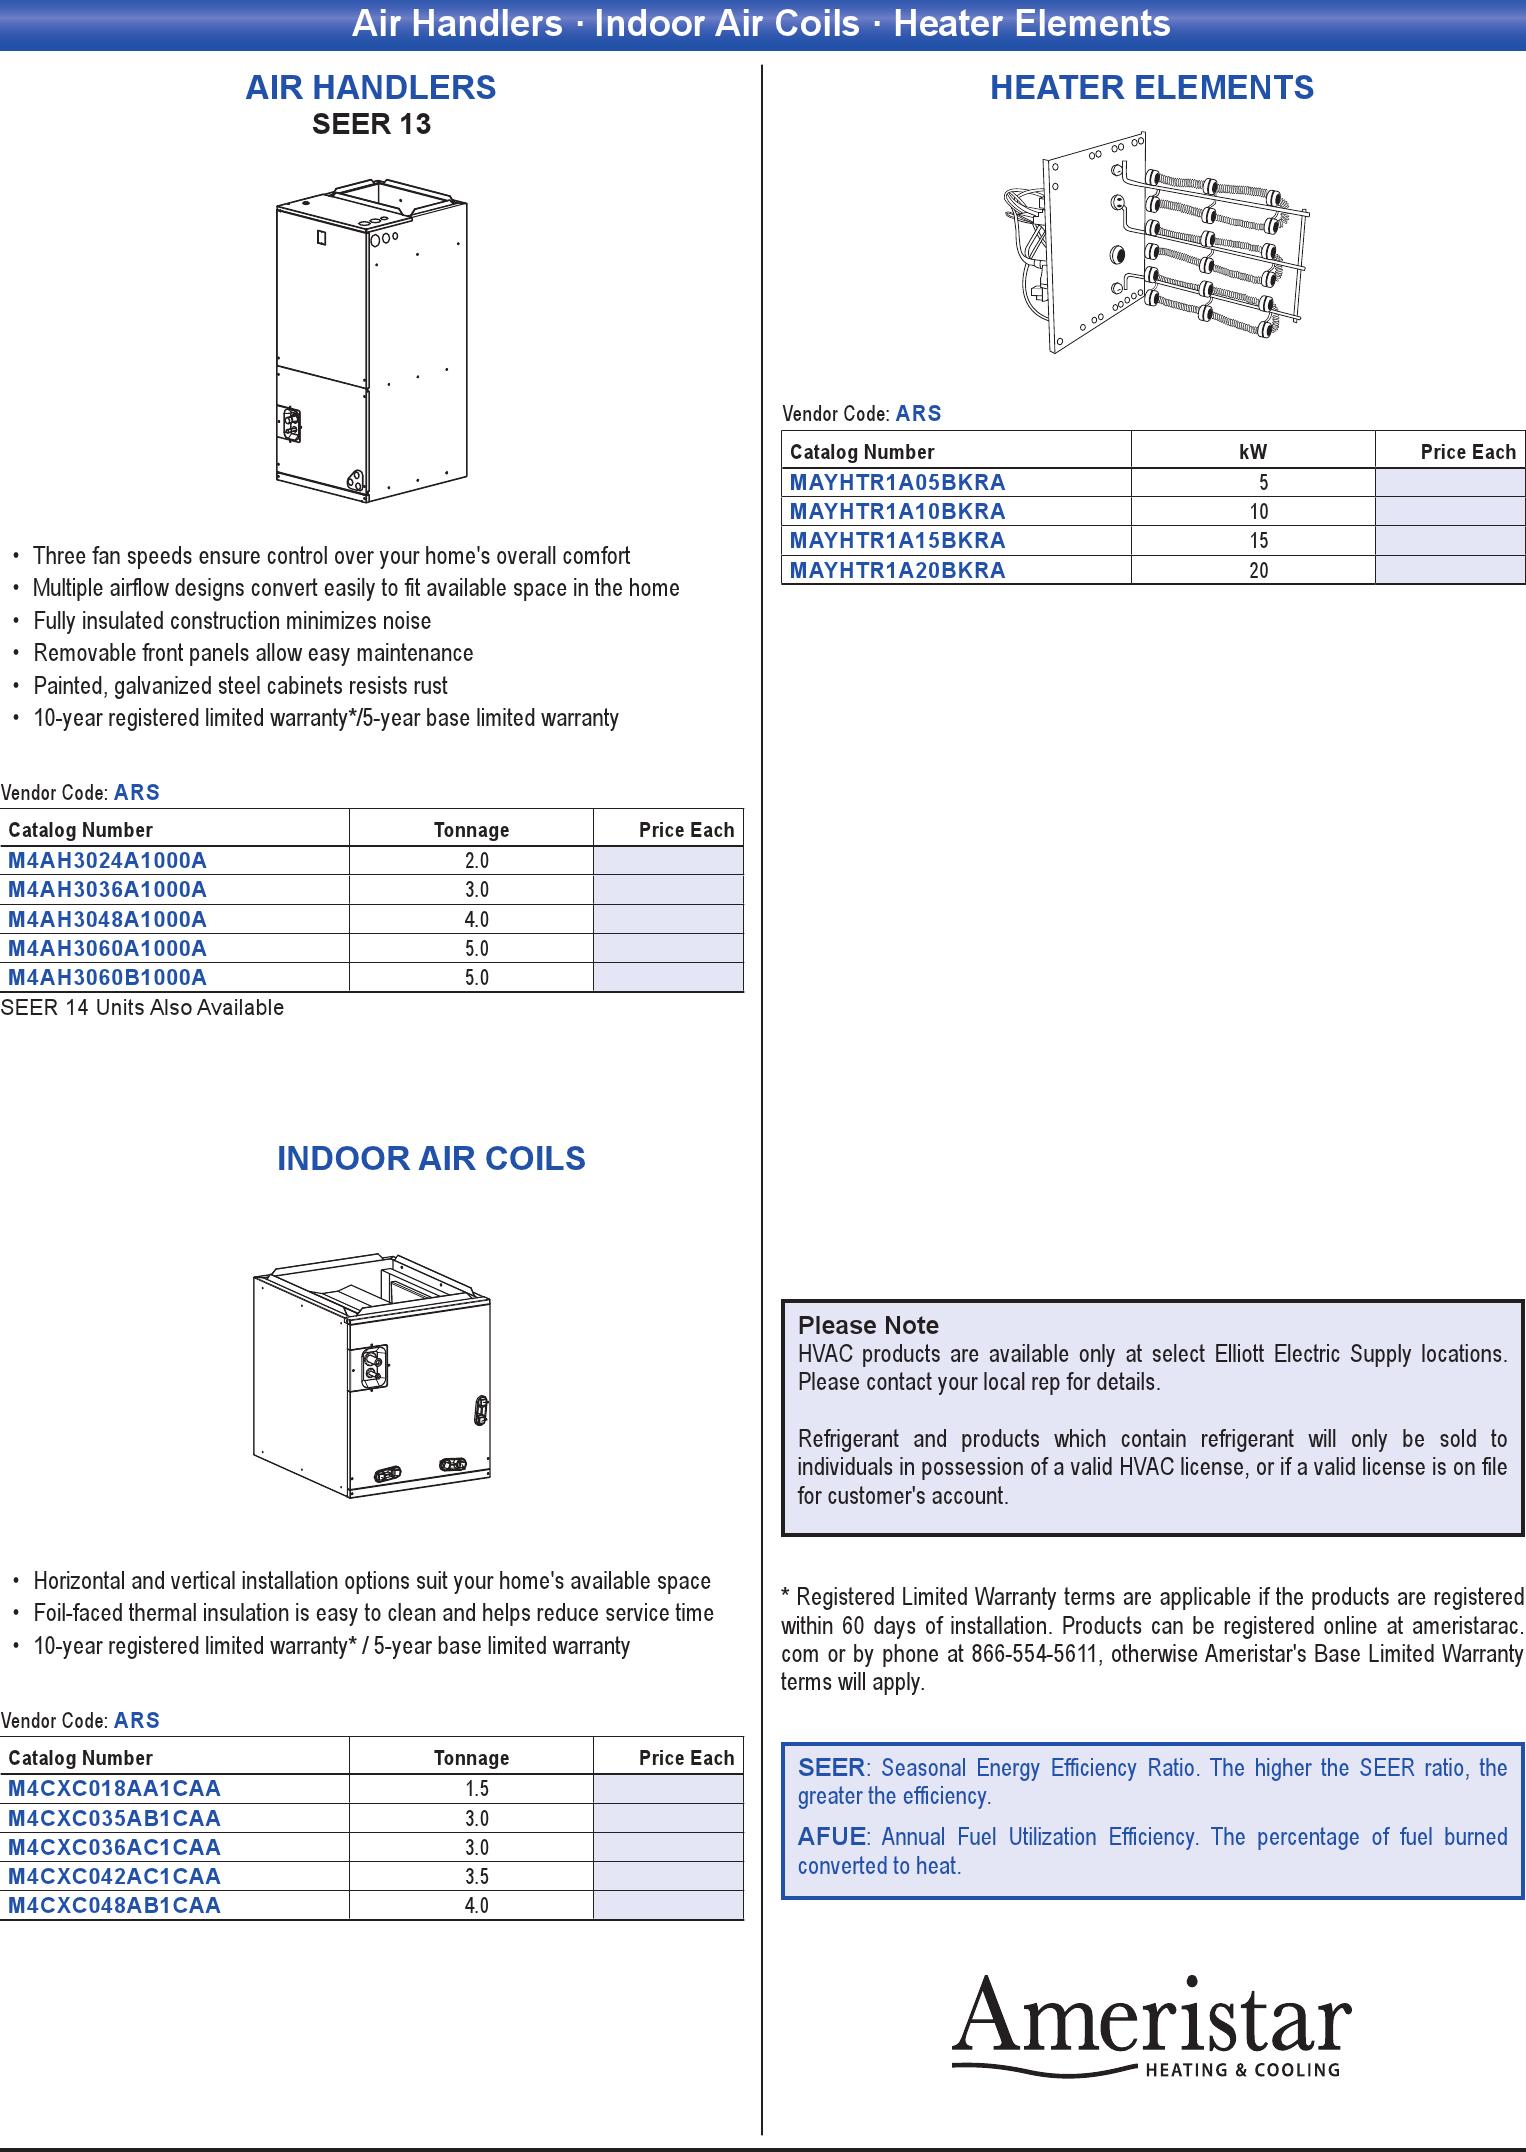 Air Handlers · Indoor Air Coils · Heater Elements - Print